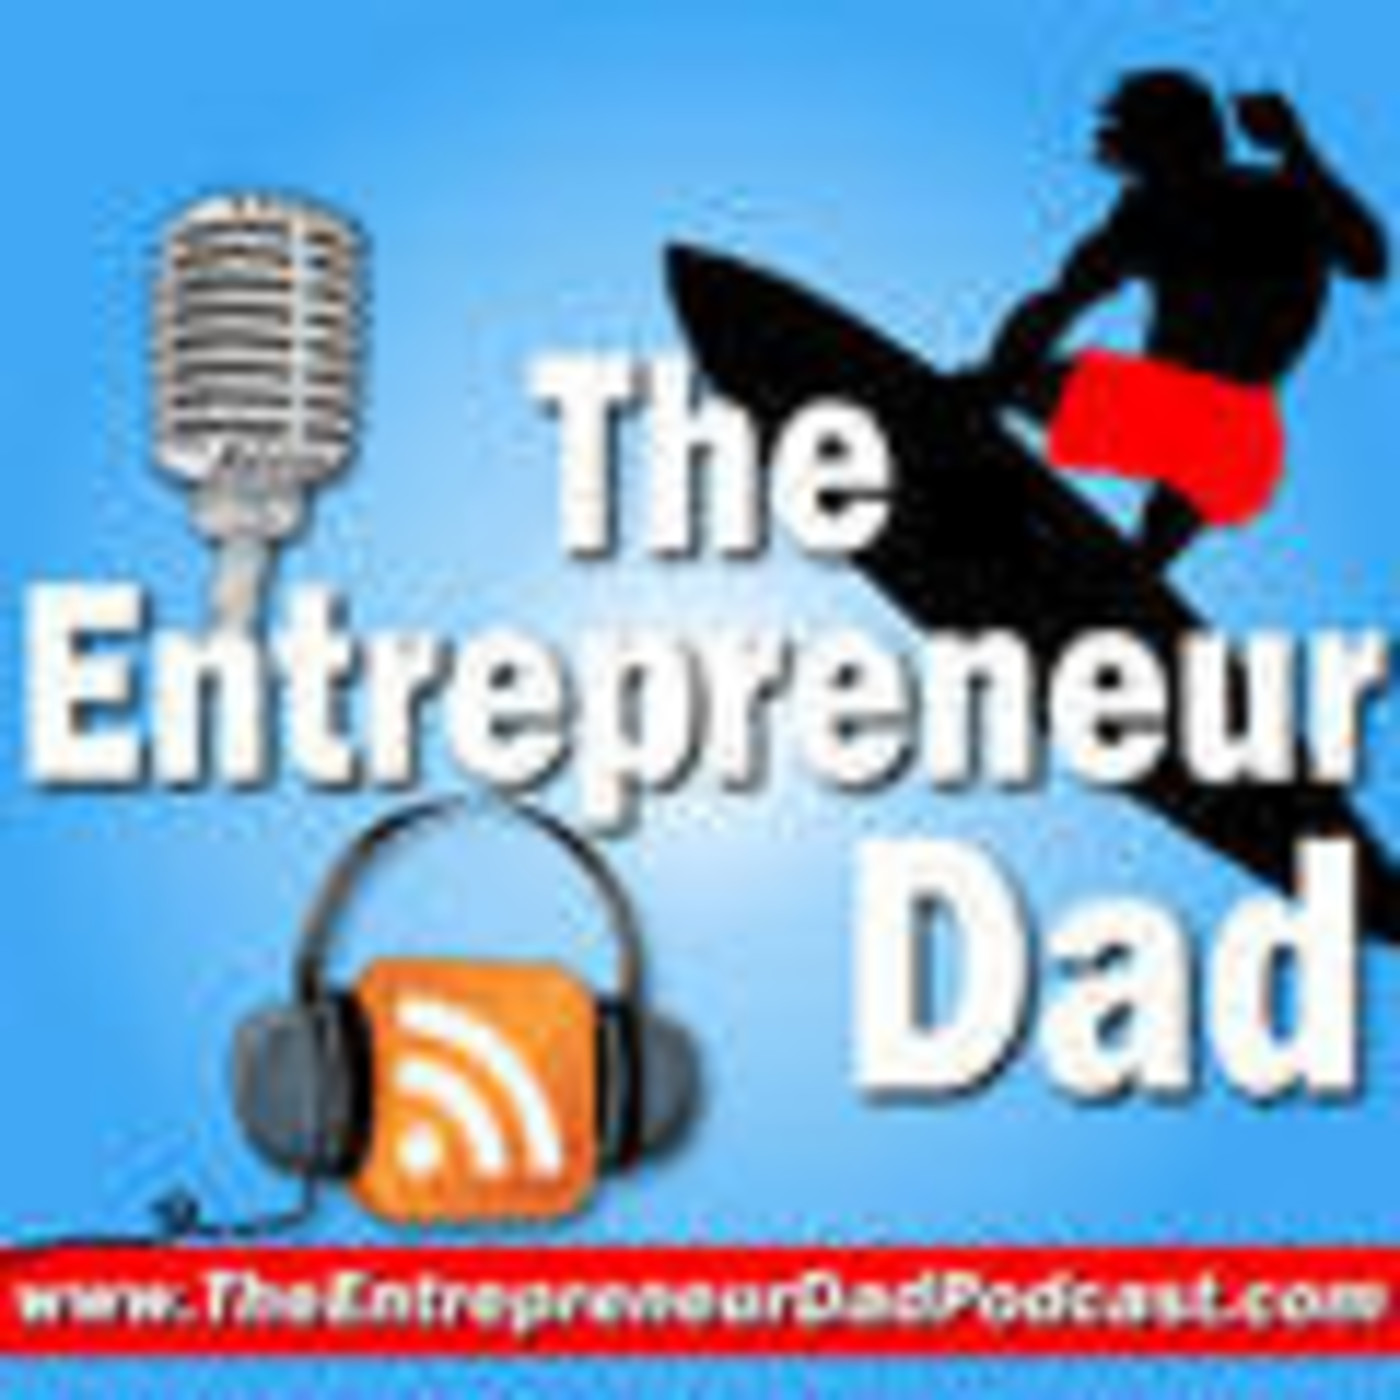 Paul Kemp : Entrepreneur And H